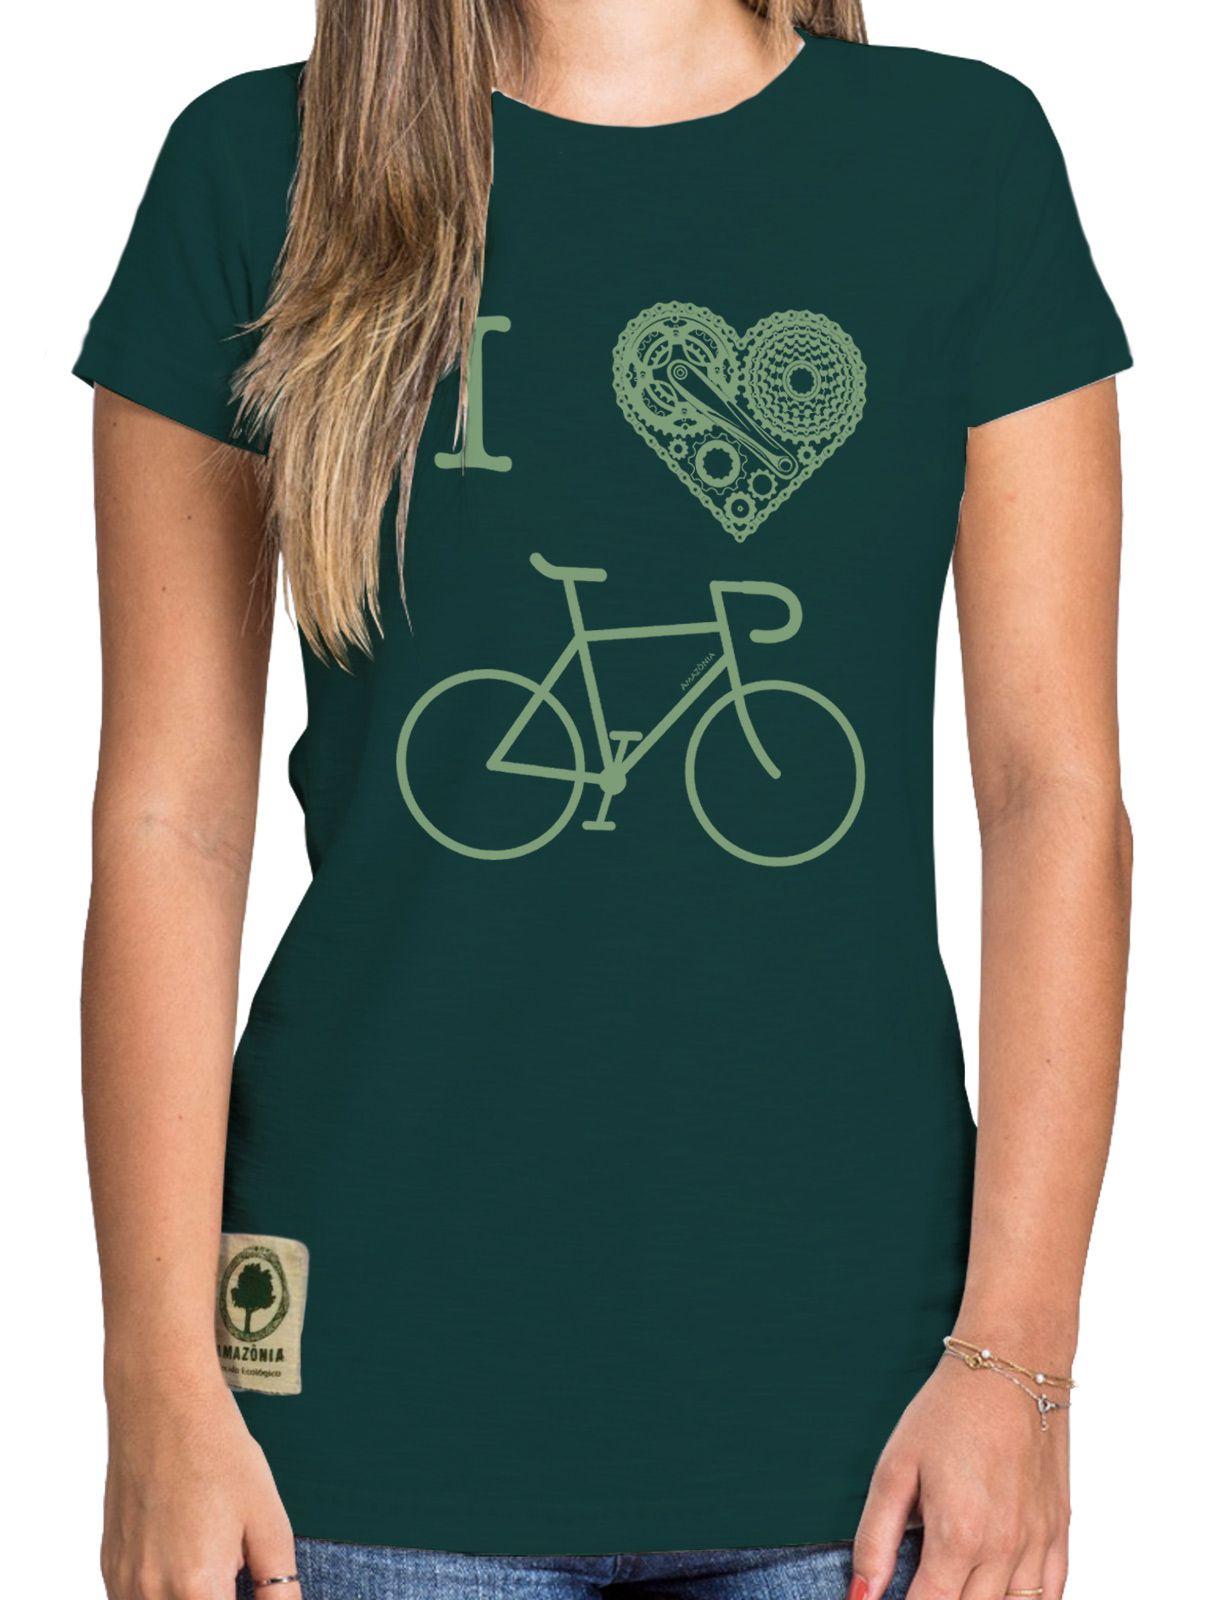 Baby Look Amazônia I Love Bike - Verde Escuro